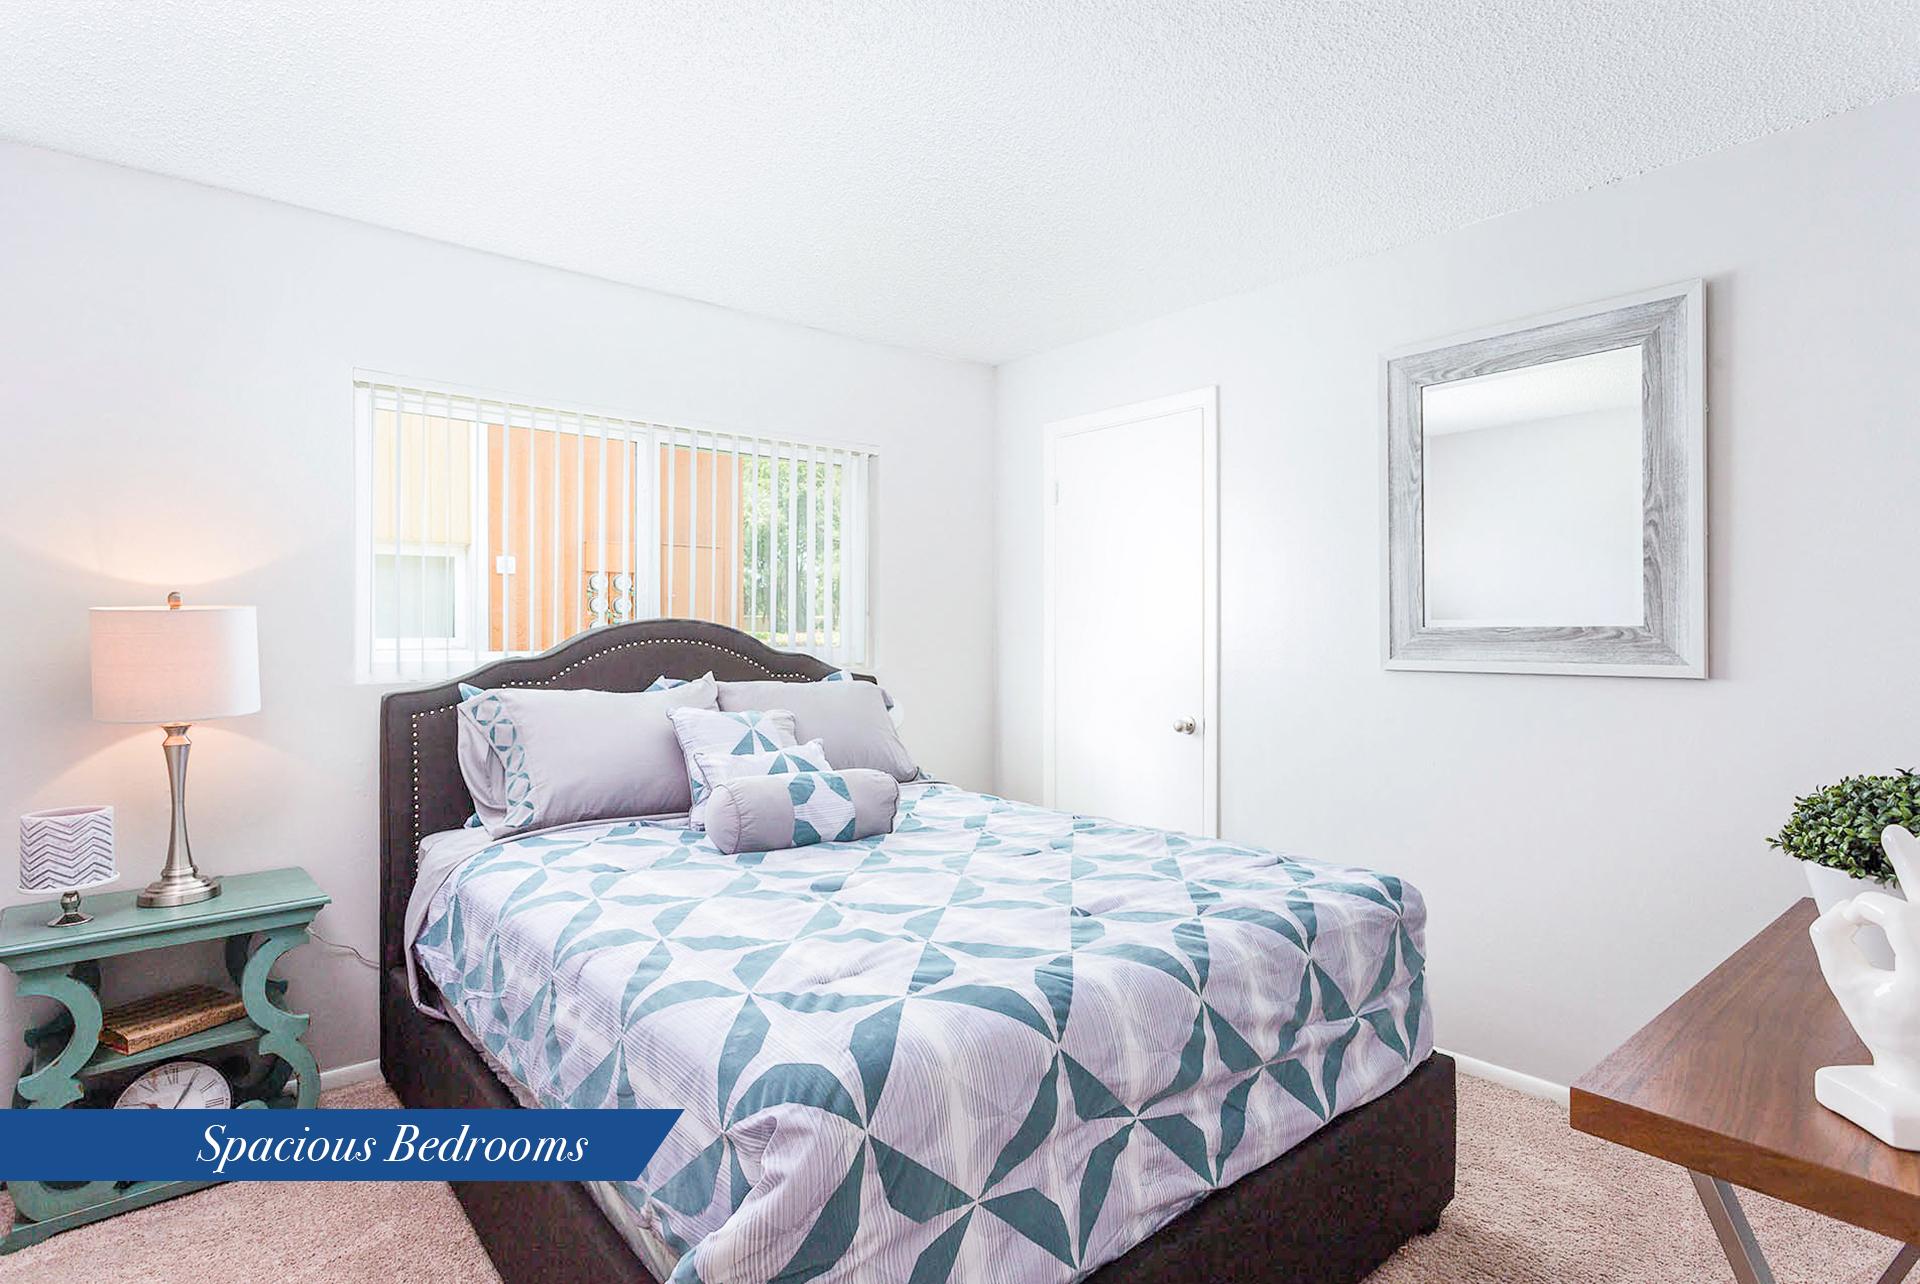 2b1-5b-930-bc-20bedroom-20l-2